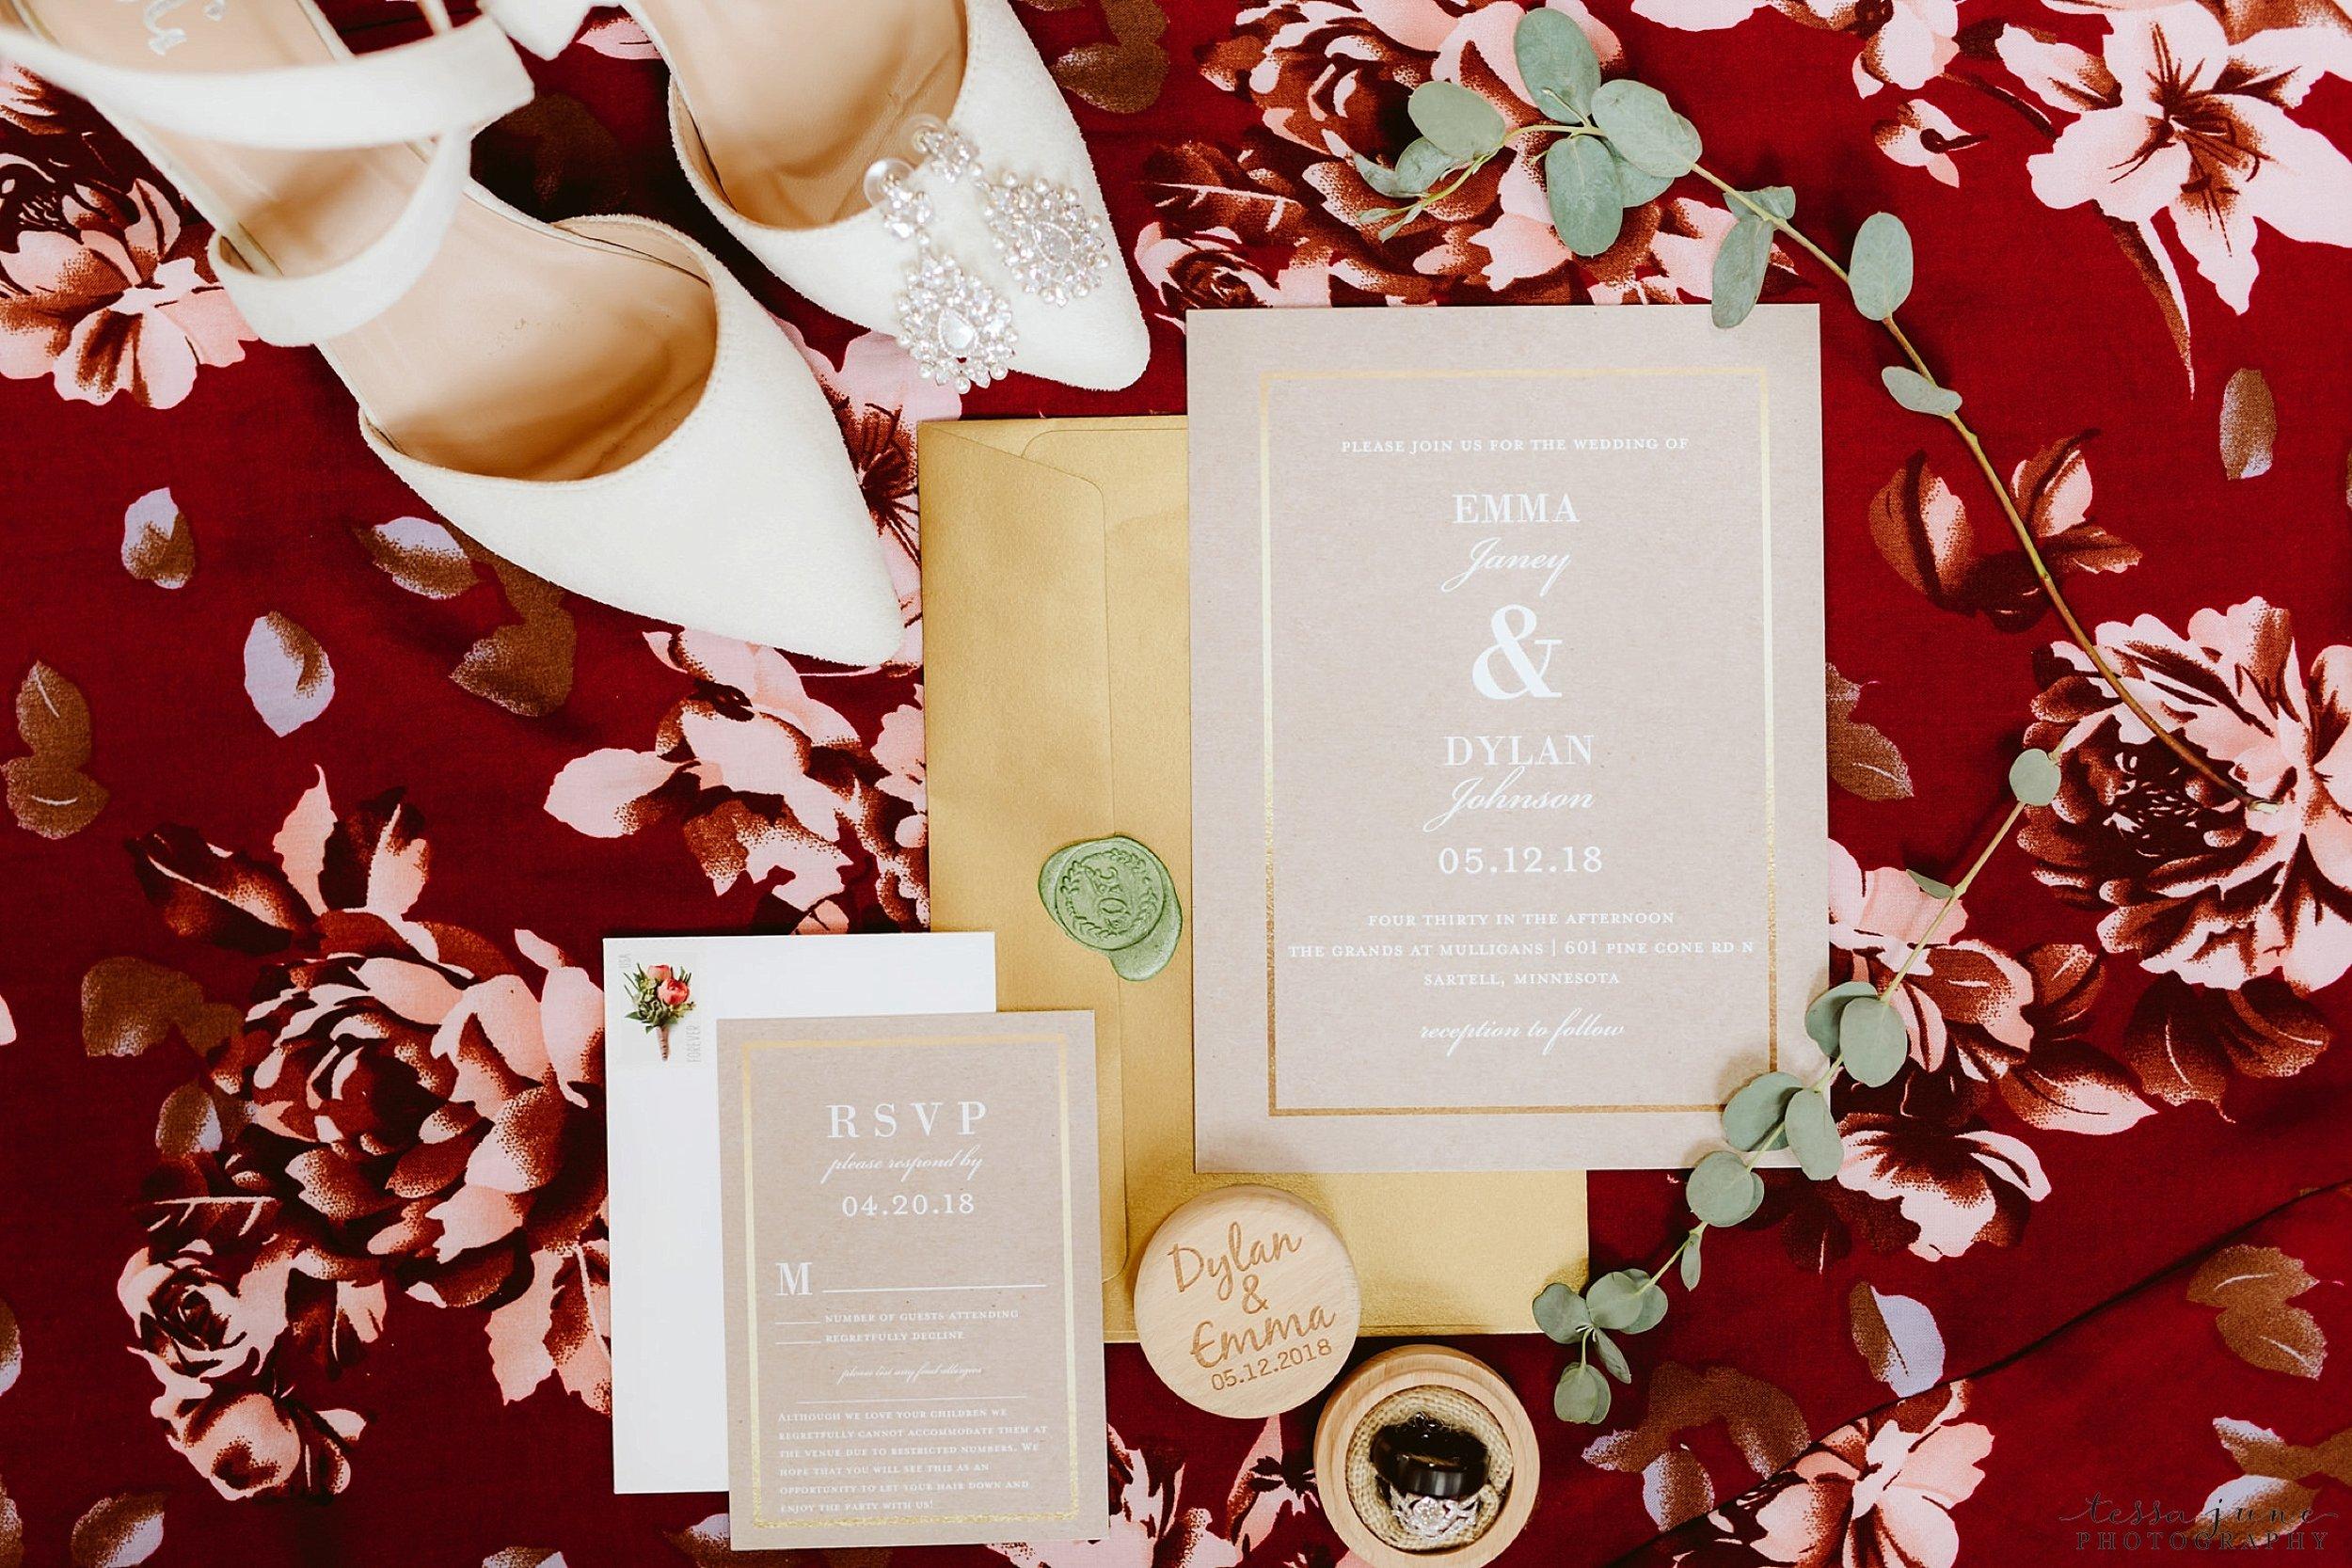 The-grands-at-mulligans-wedding-sartell-minnesota-spring-floral-spring-garden-wedding-27.jpg